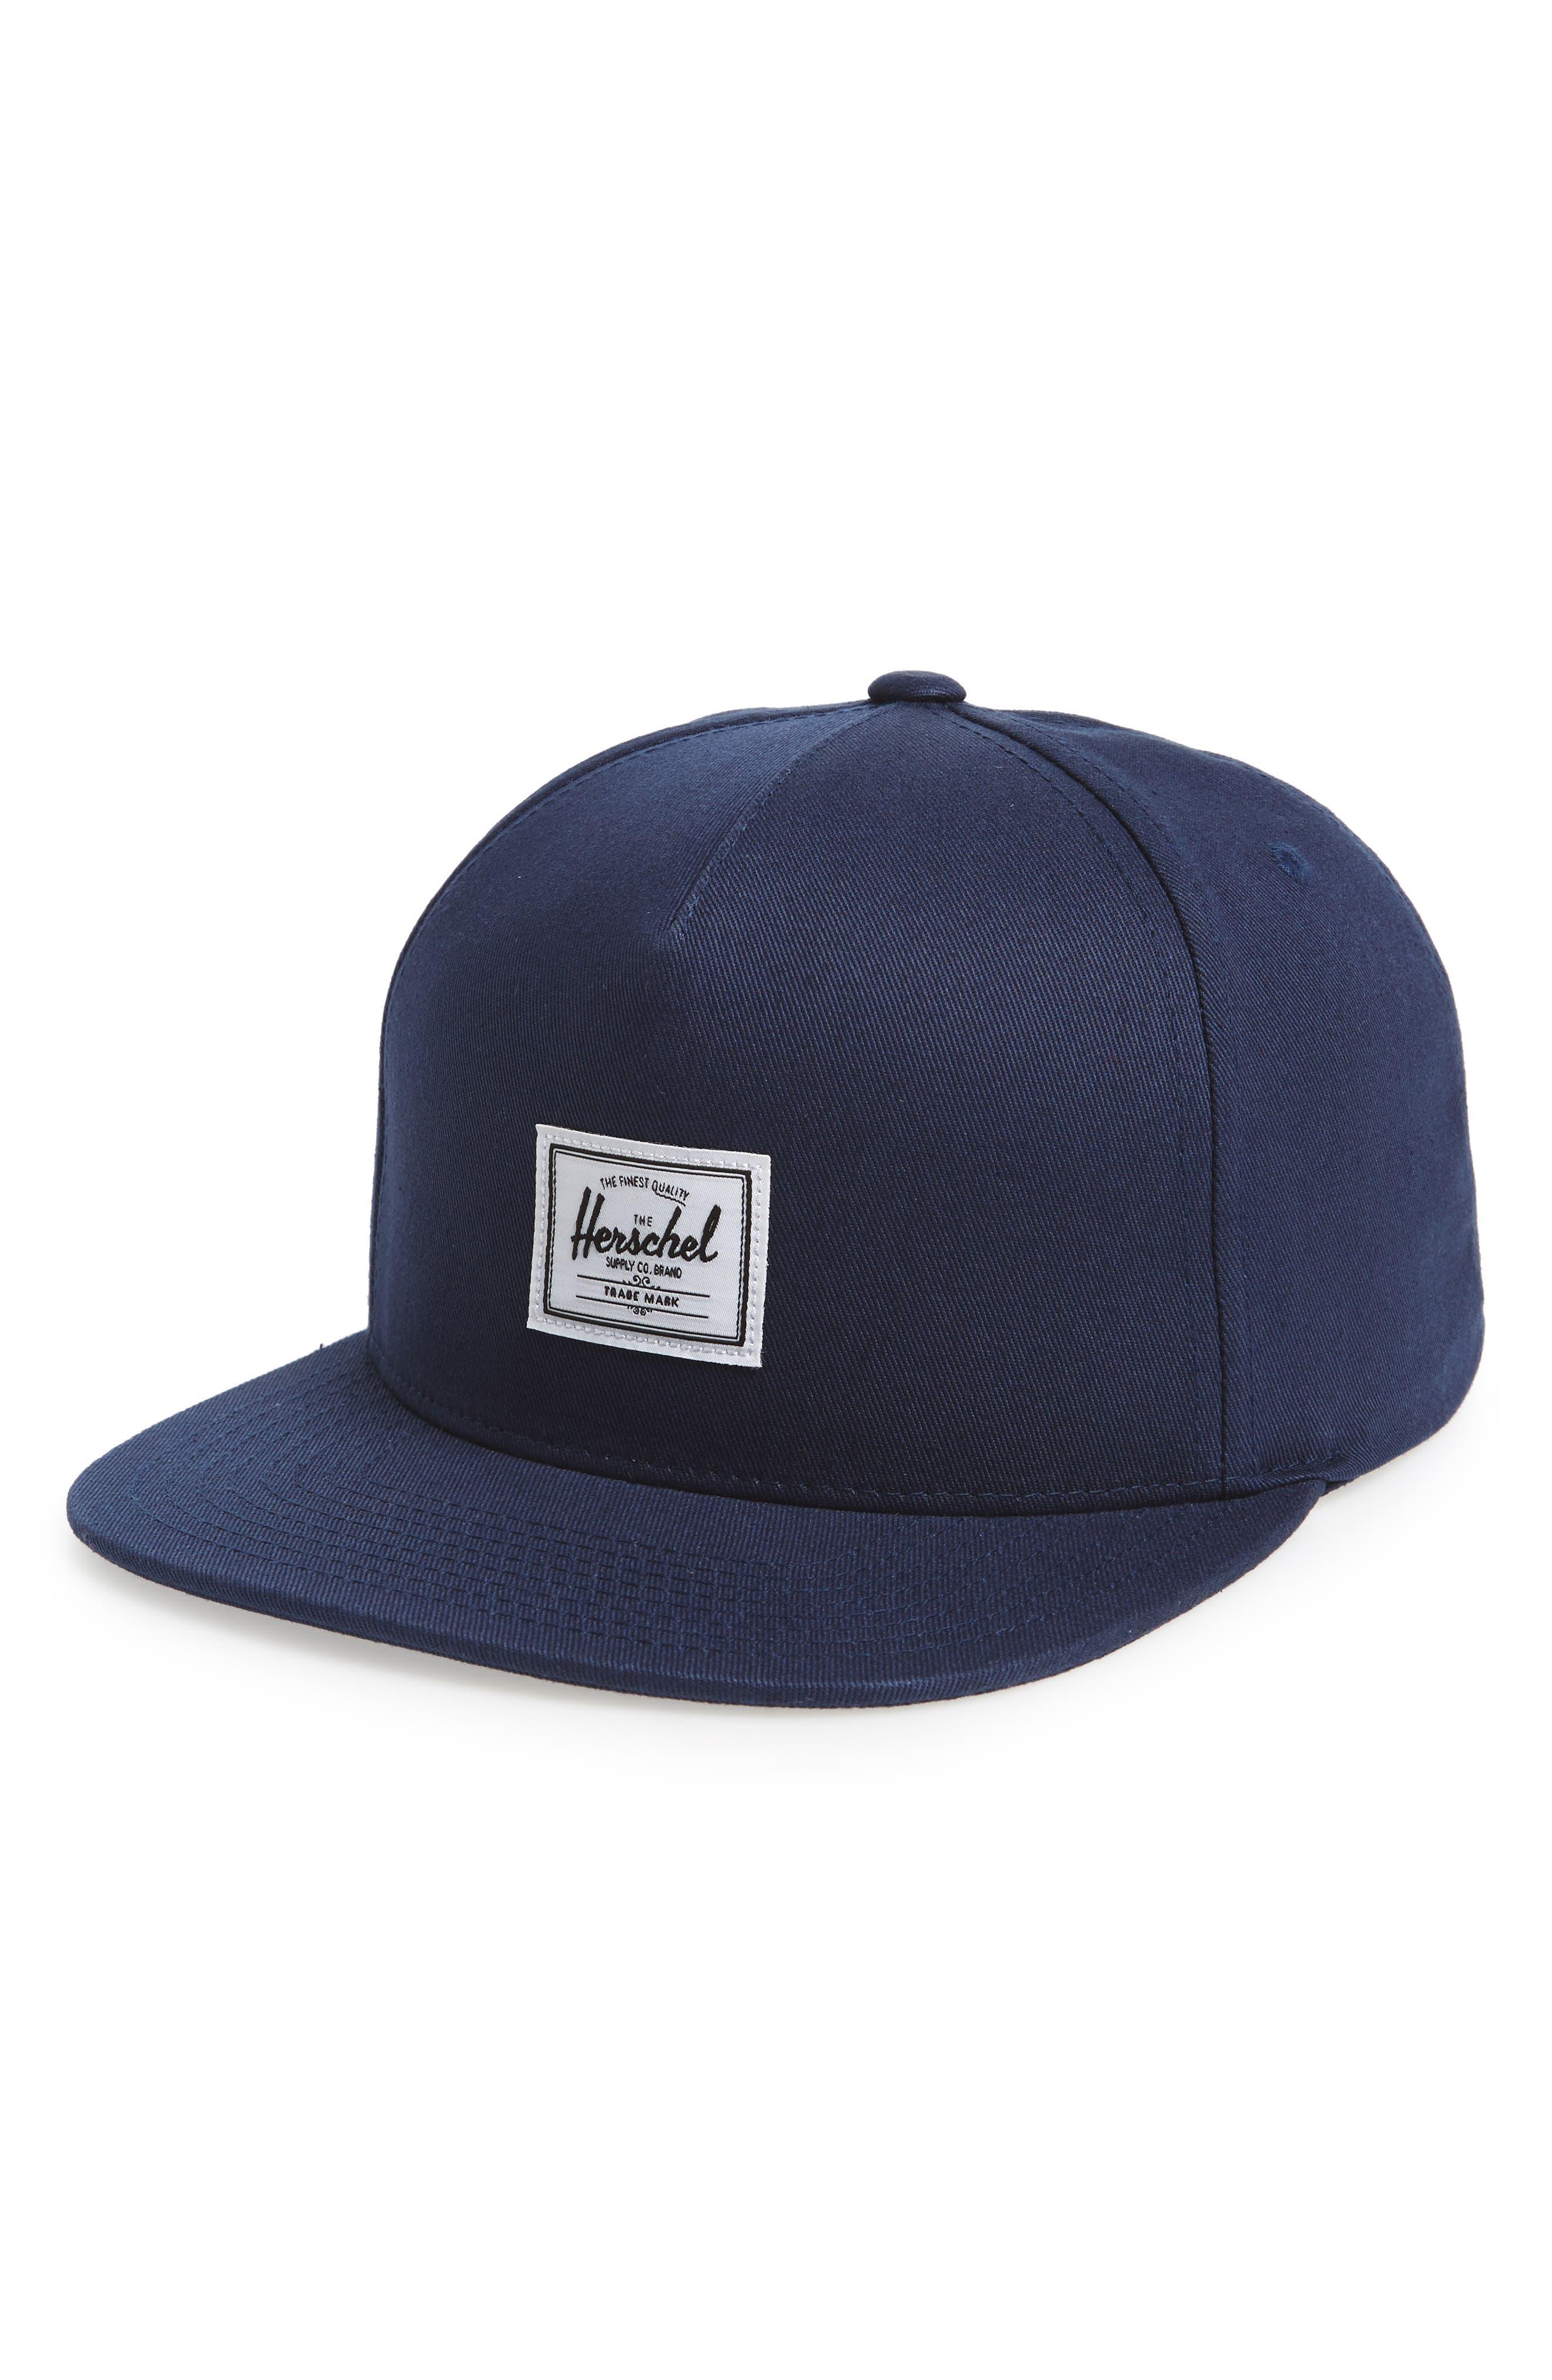 Main Image - Herschel Supply Co. Dean Snapback Baseball Cap